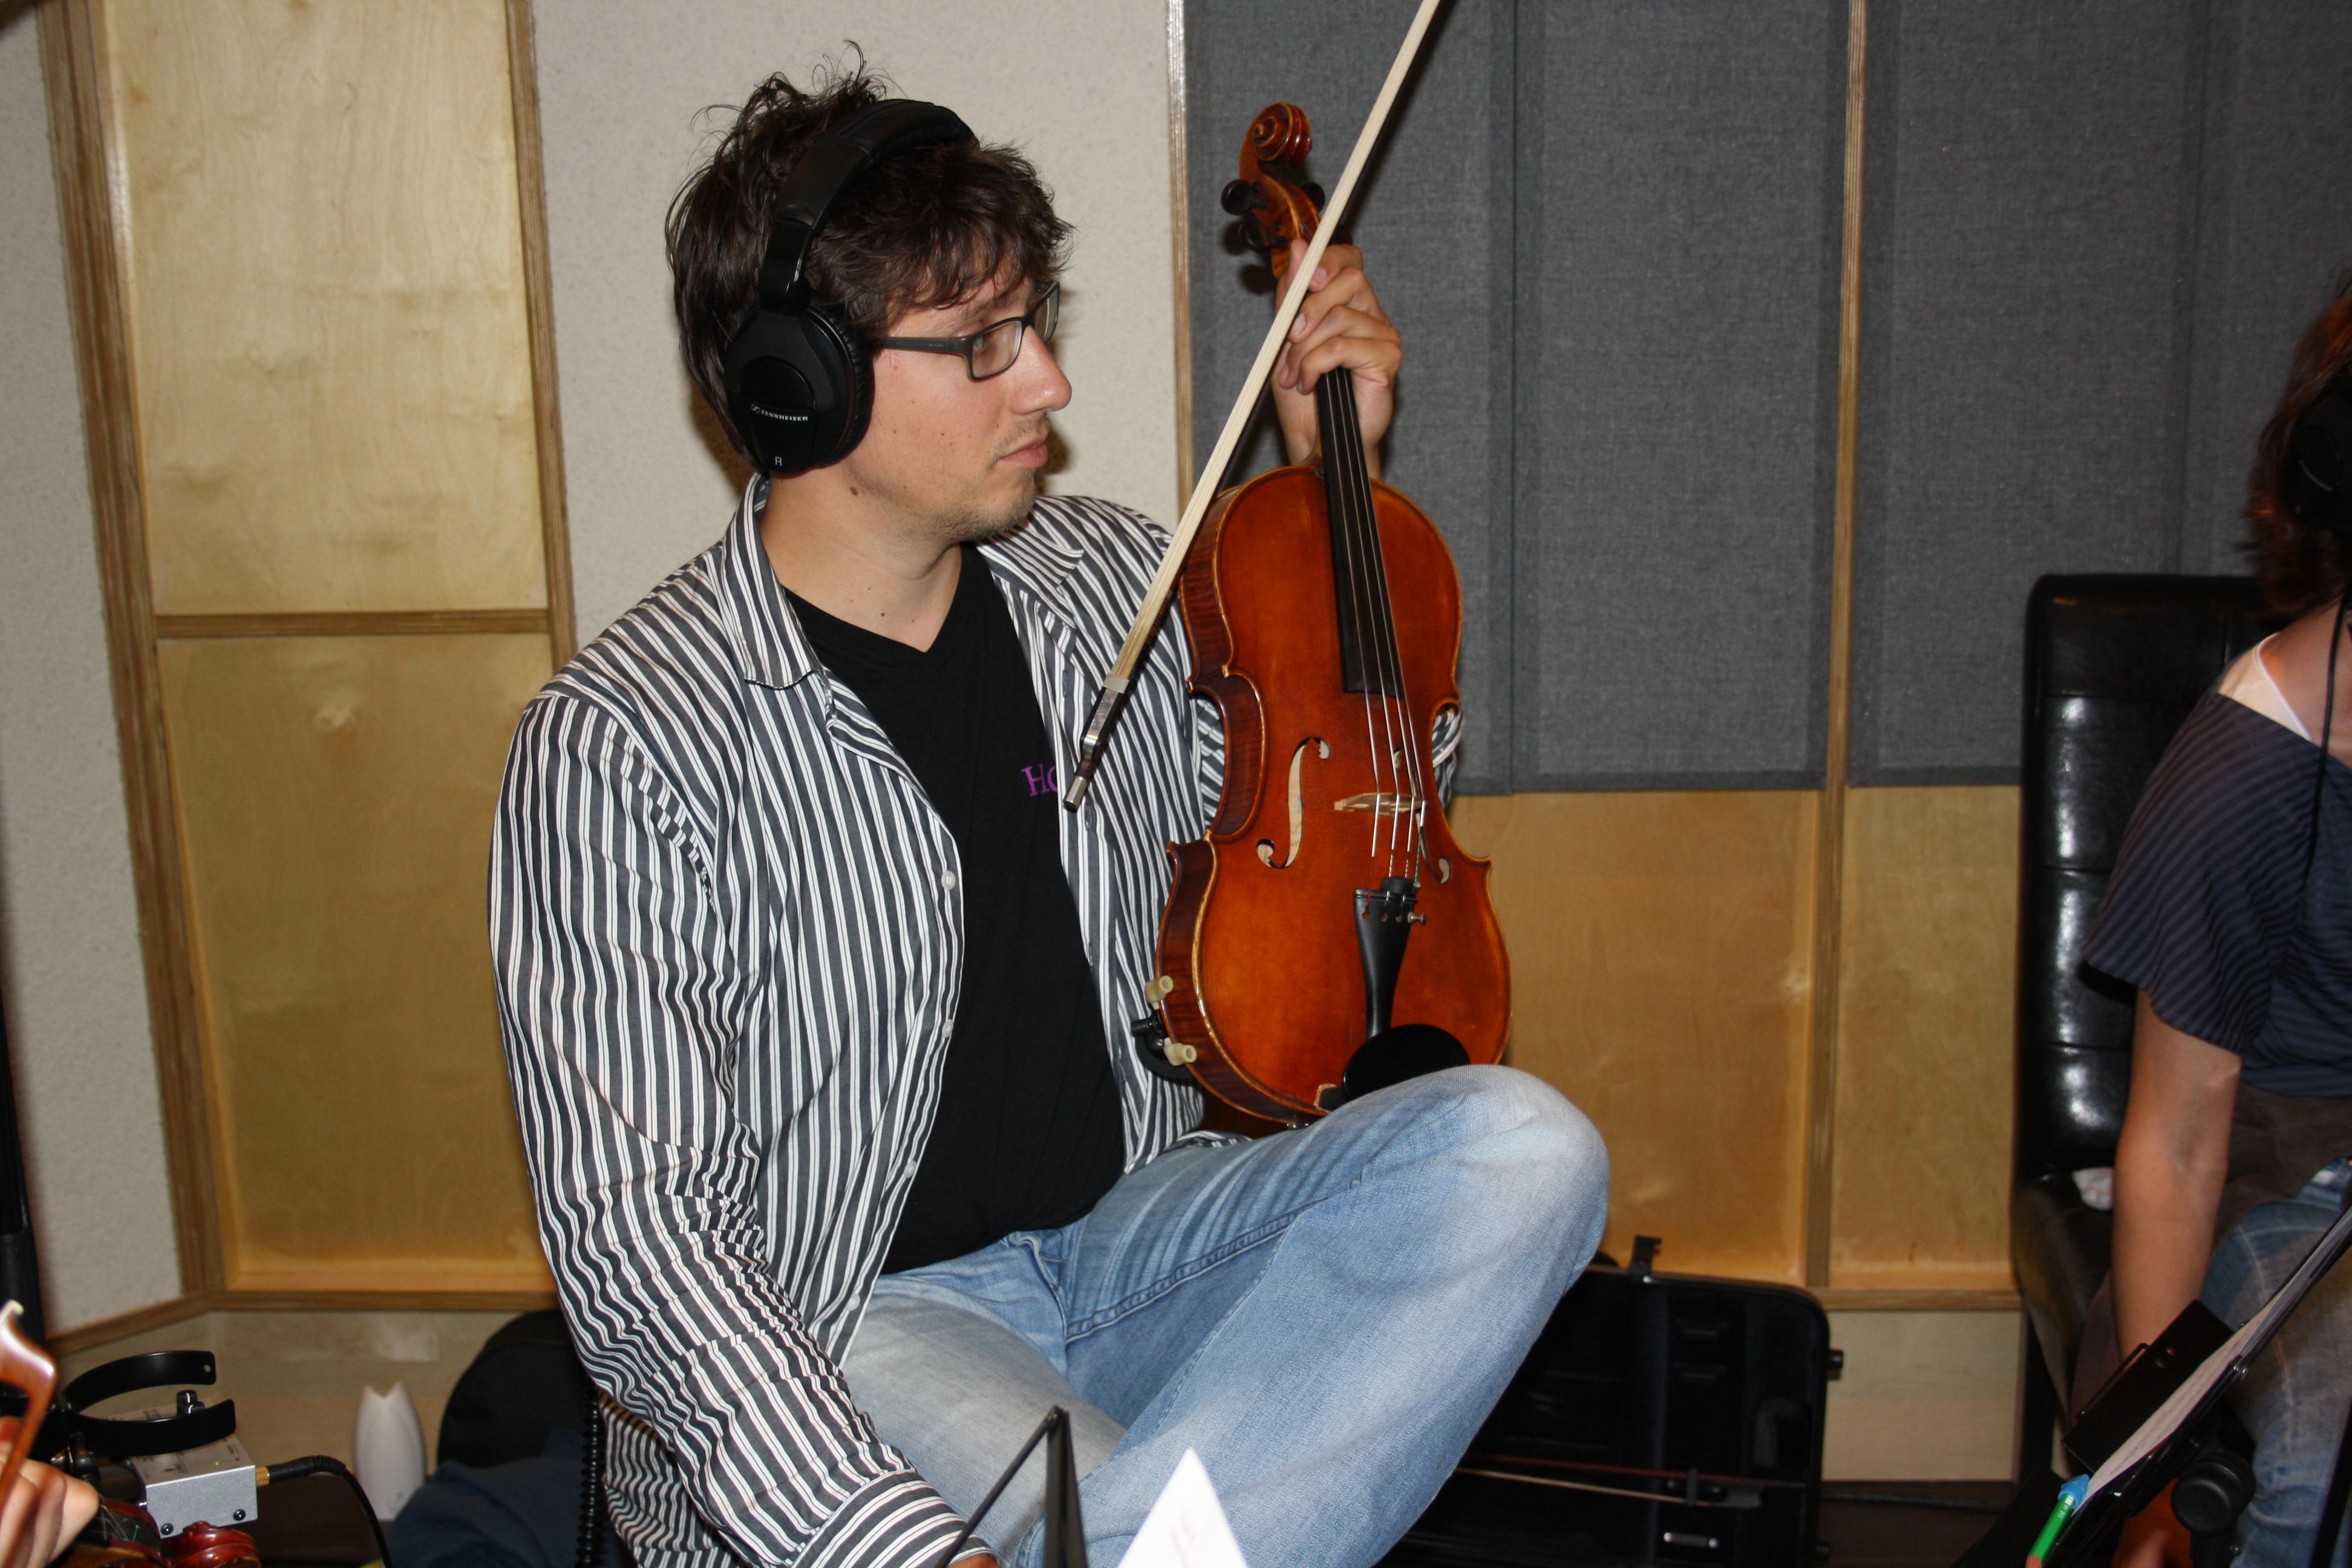 Strijkkwartet o.l.v. Tom Moonen